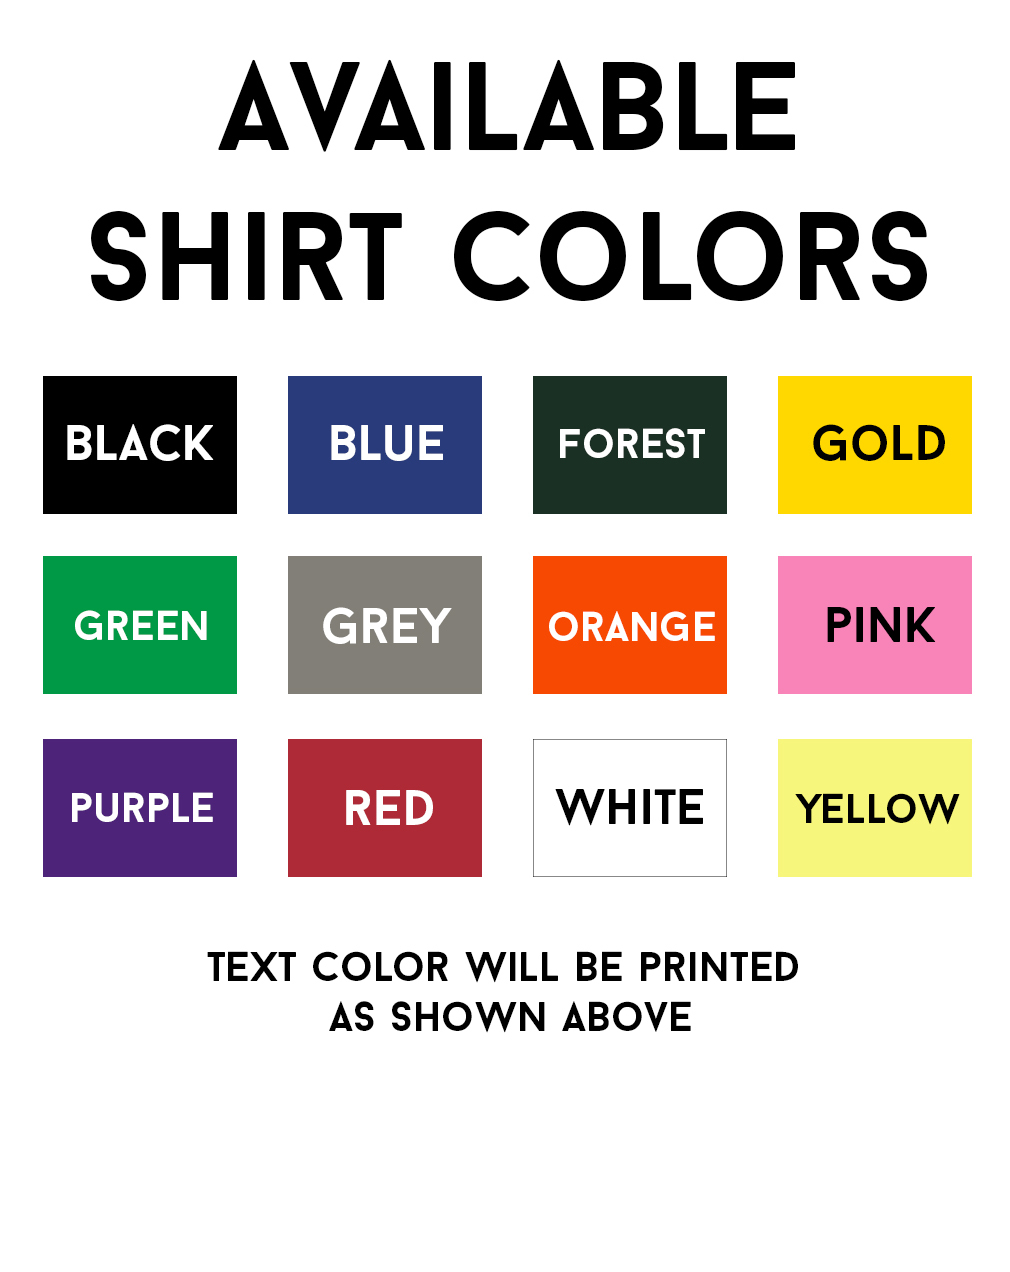 #vibrancy - Hashtag Men's Adult Short Sleeve T-Shirt  image 2